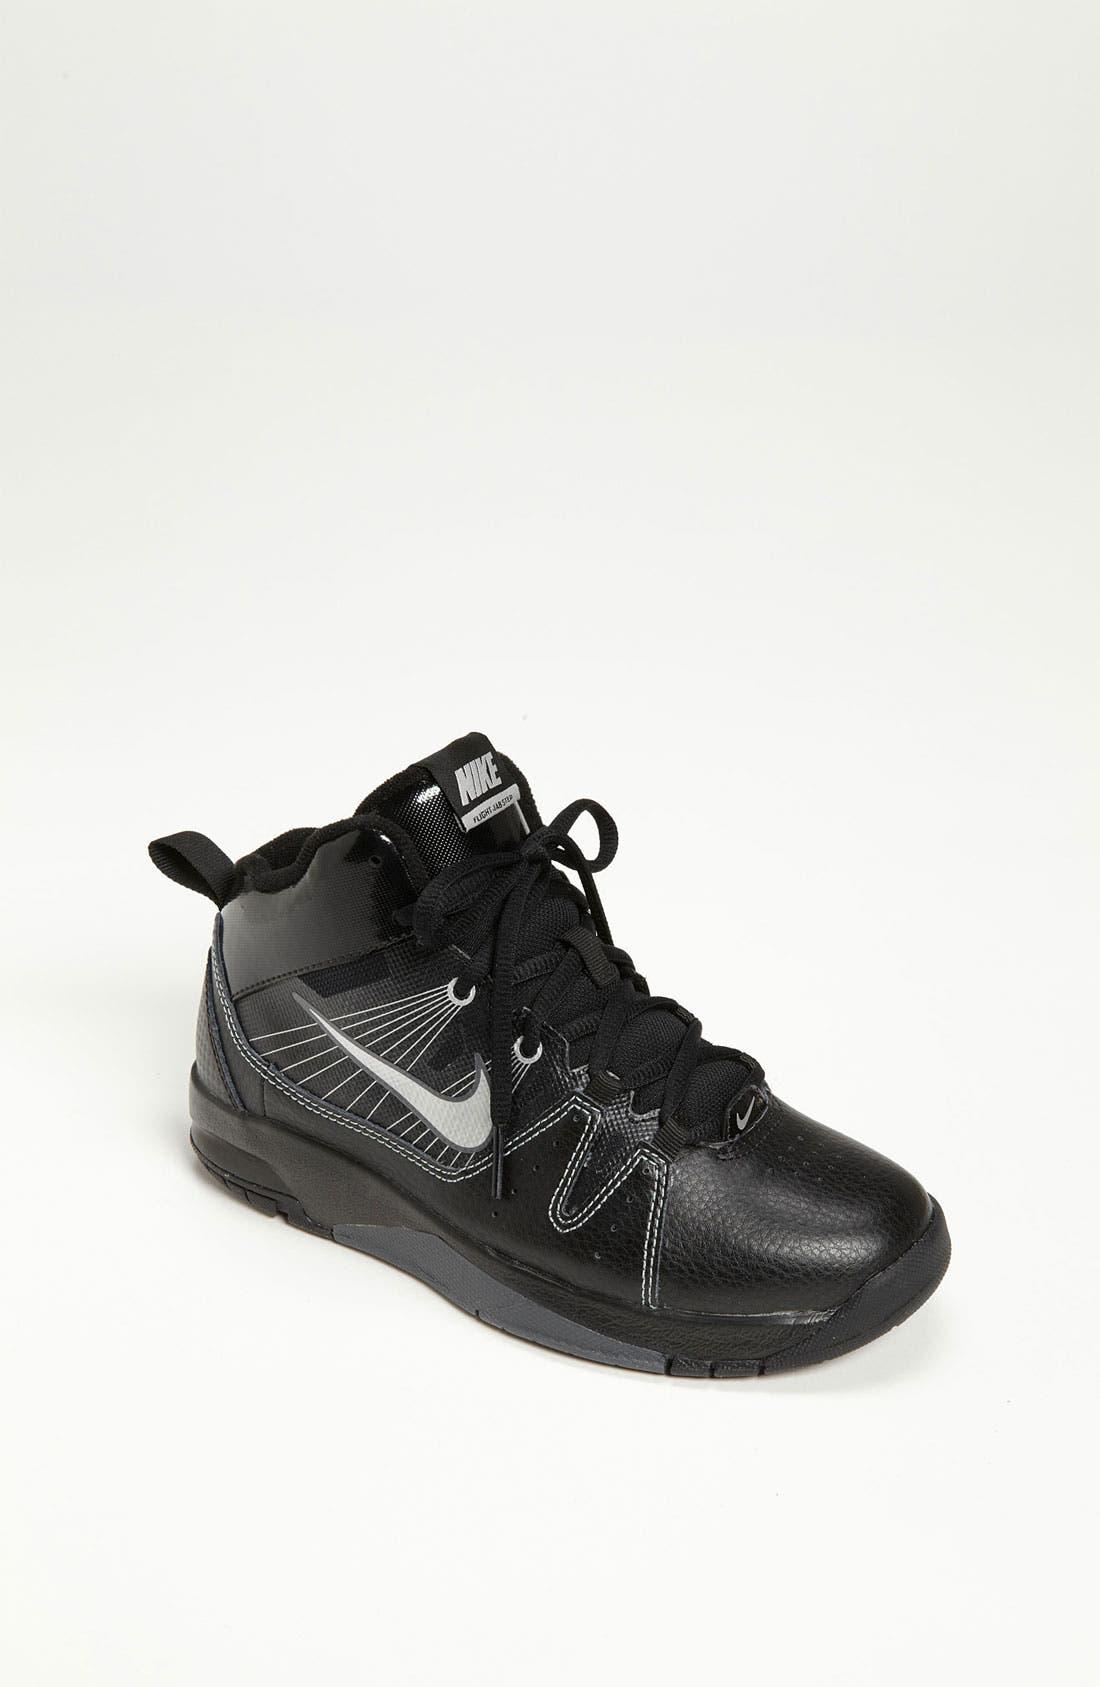 Main Image - Nike 'Flight Jab Step' Basketball Shoe (Toddler, Little Kid & Big Kid)